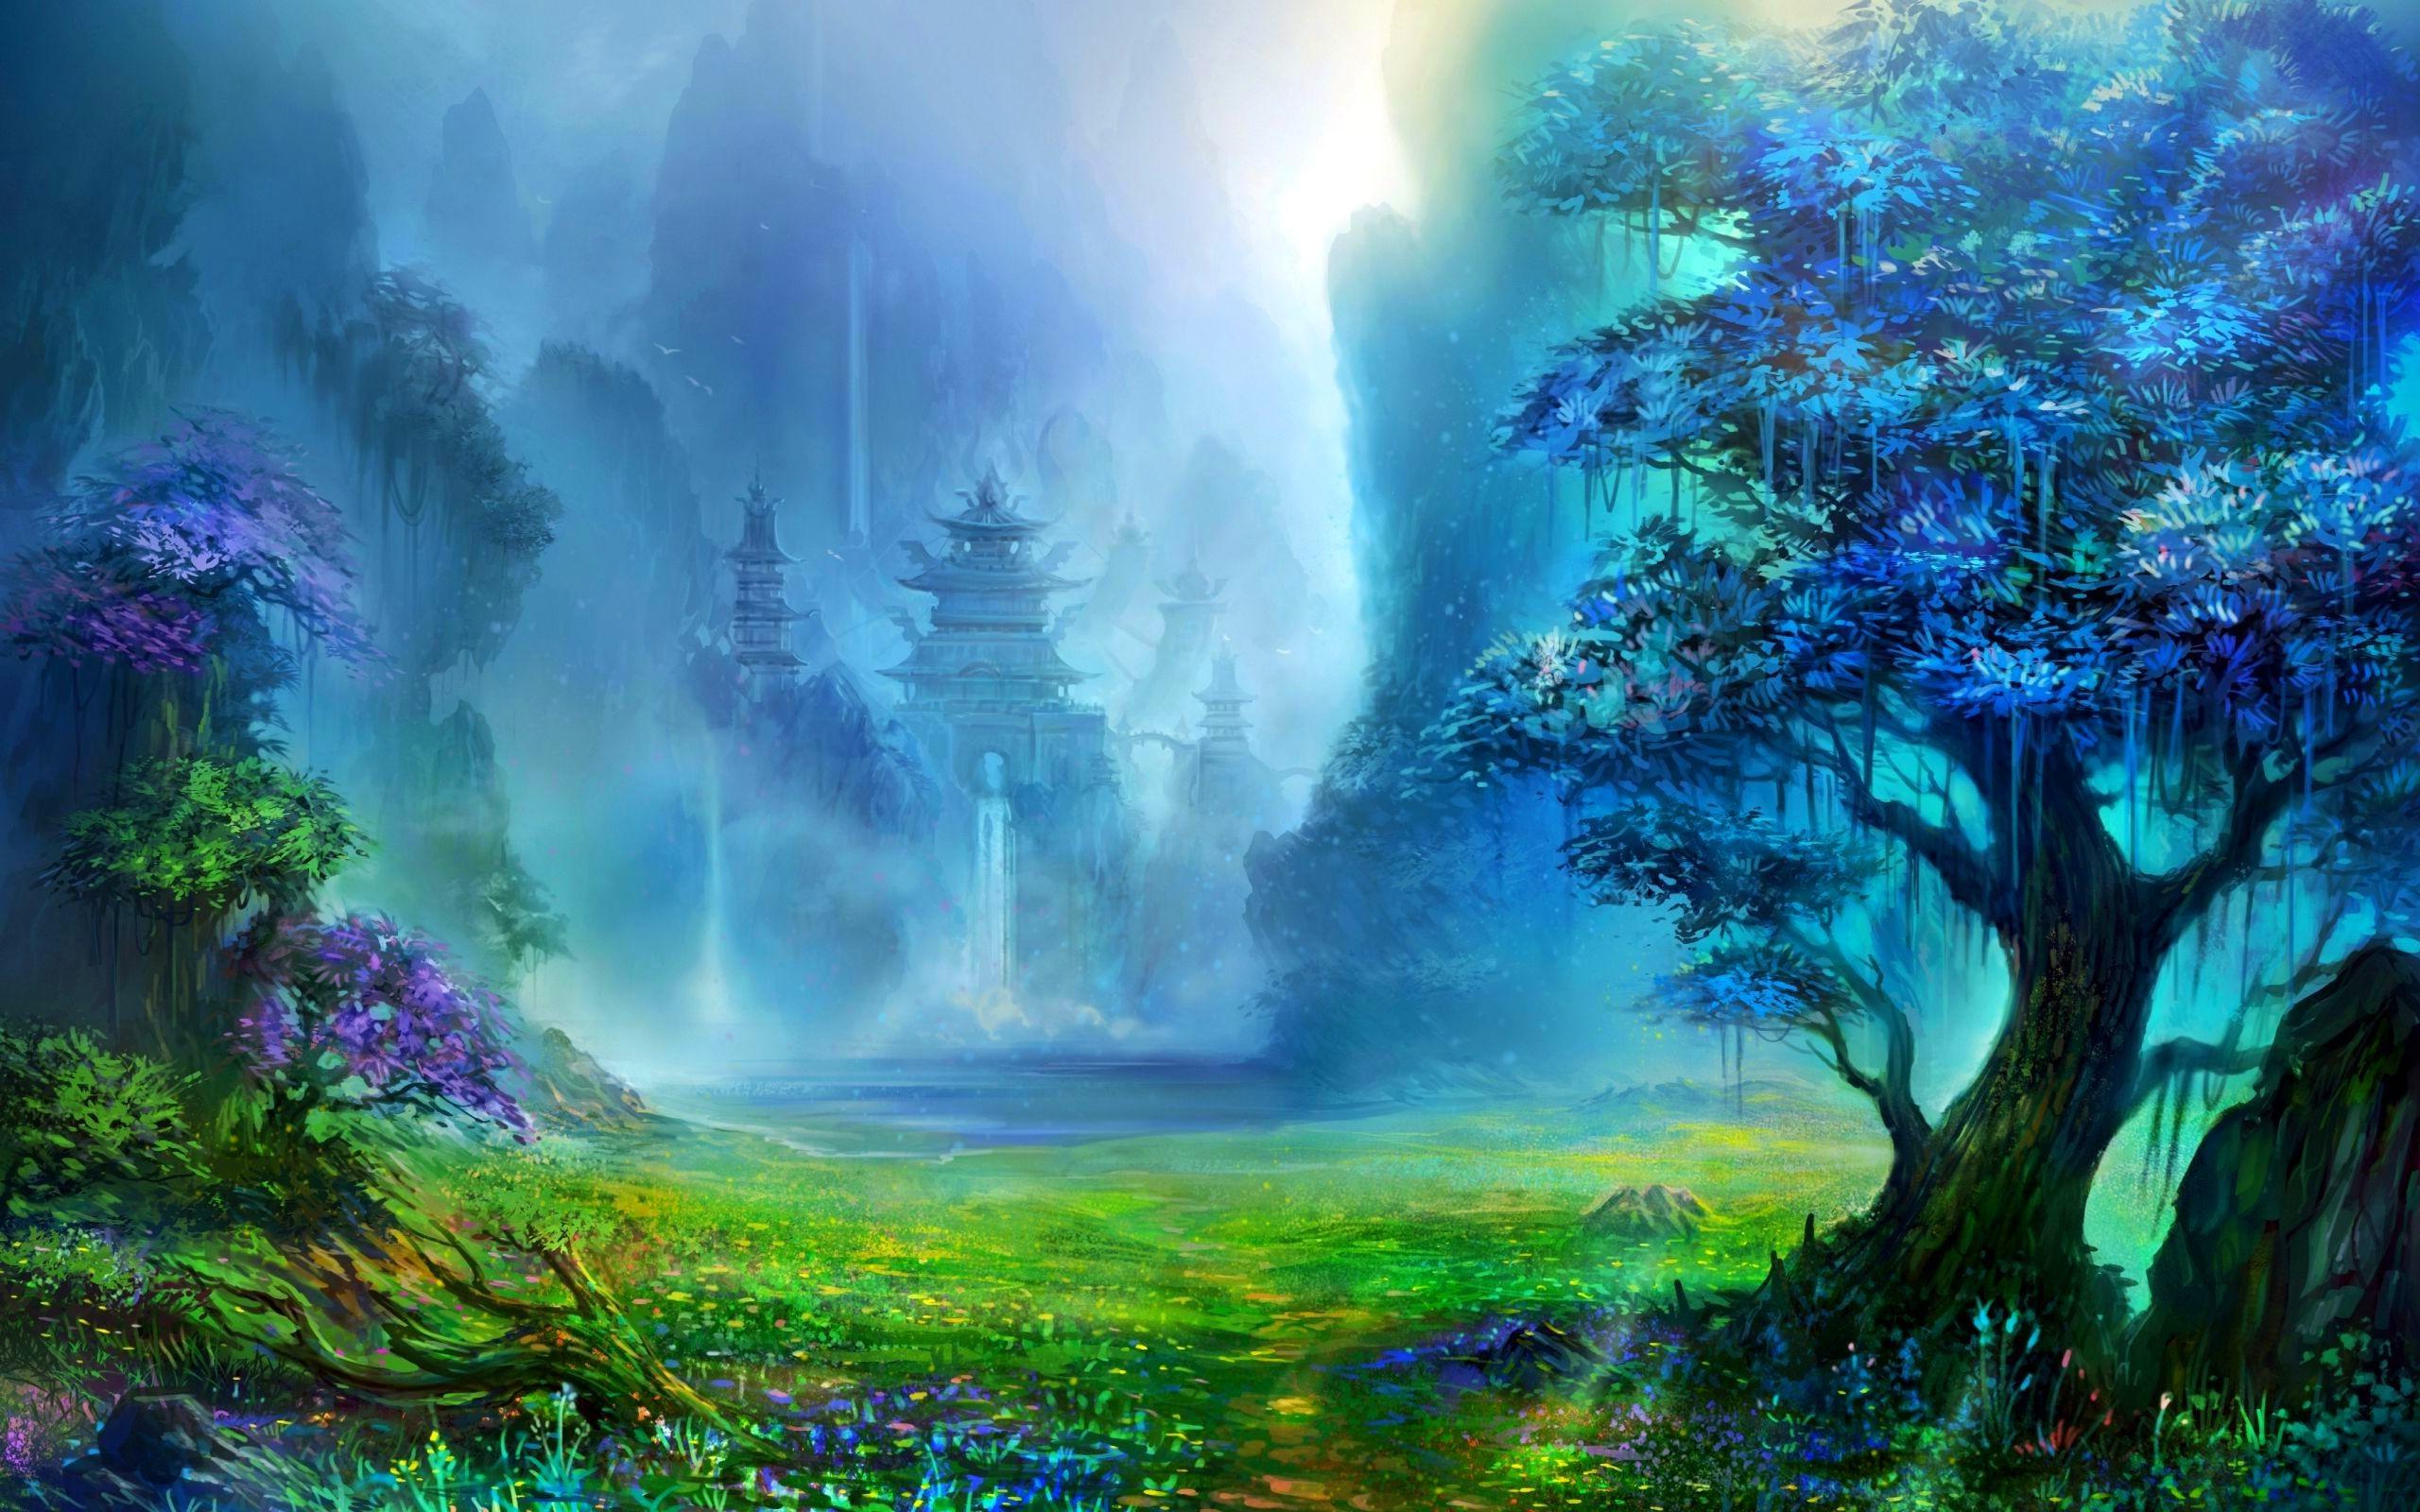 art picture wallpaper,natural landscape,nature,natural environment,forest,jungle